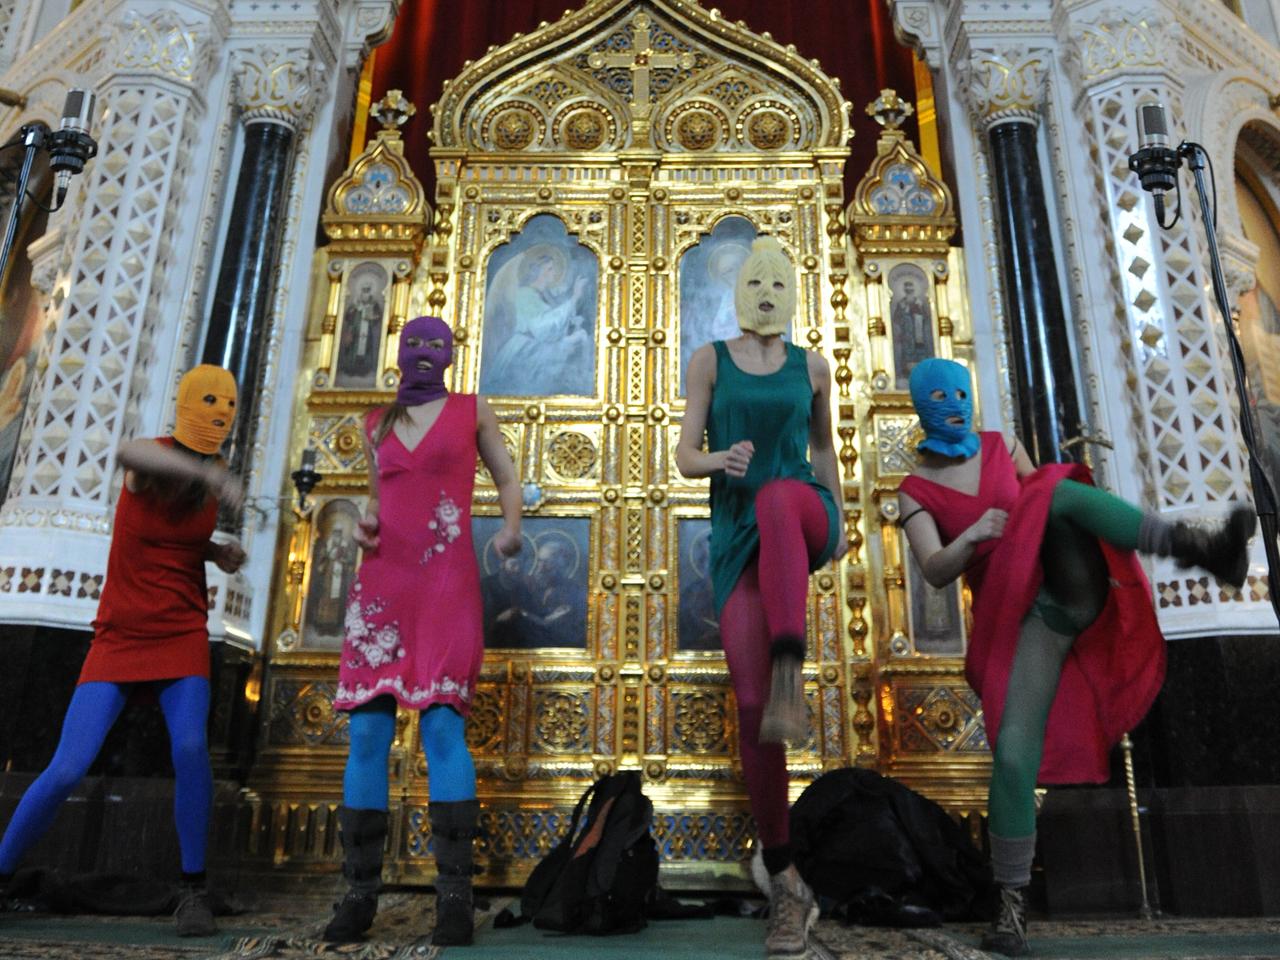 Pussy Riot, Punk Prayer 3, 2012